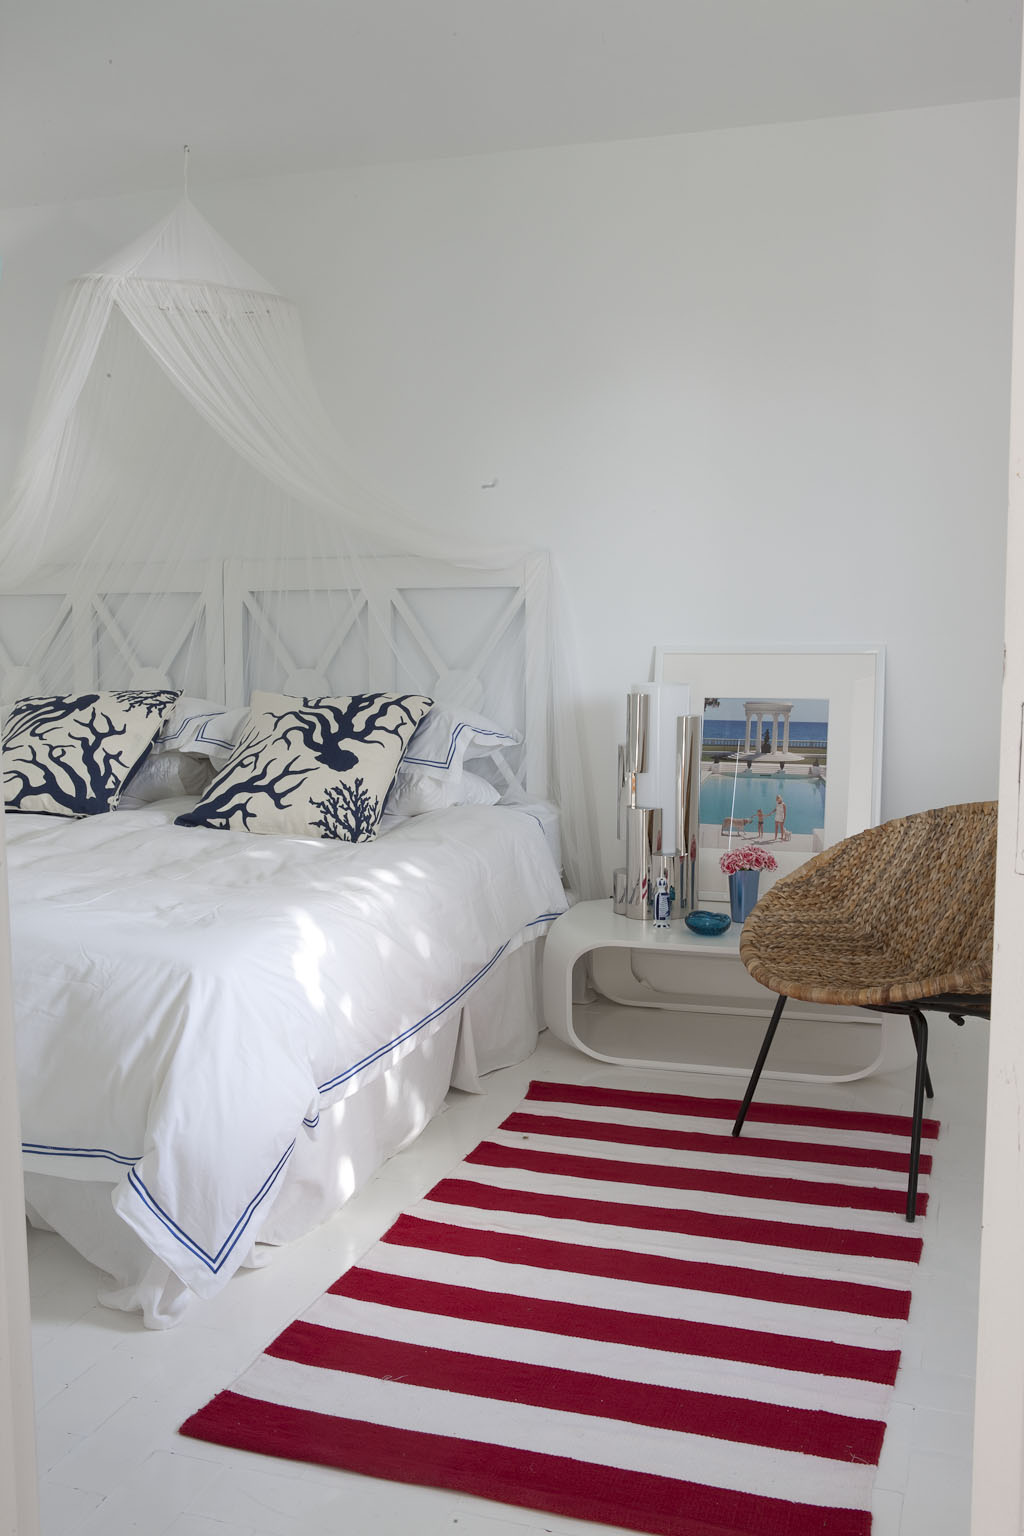 Areas Beach House-Galicia-Spain